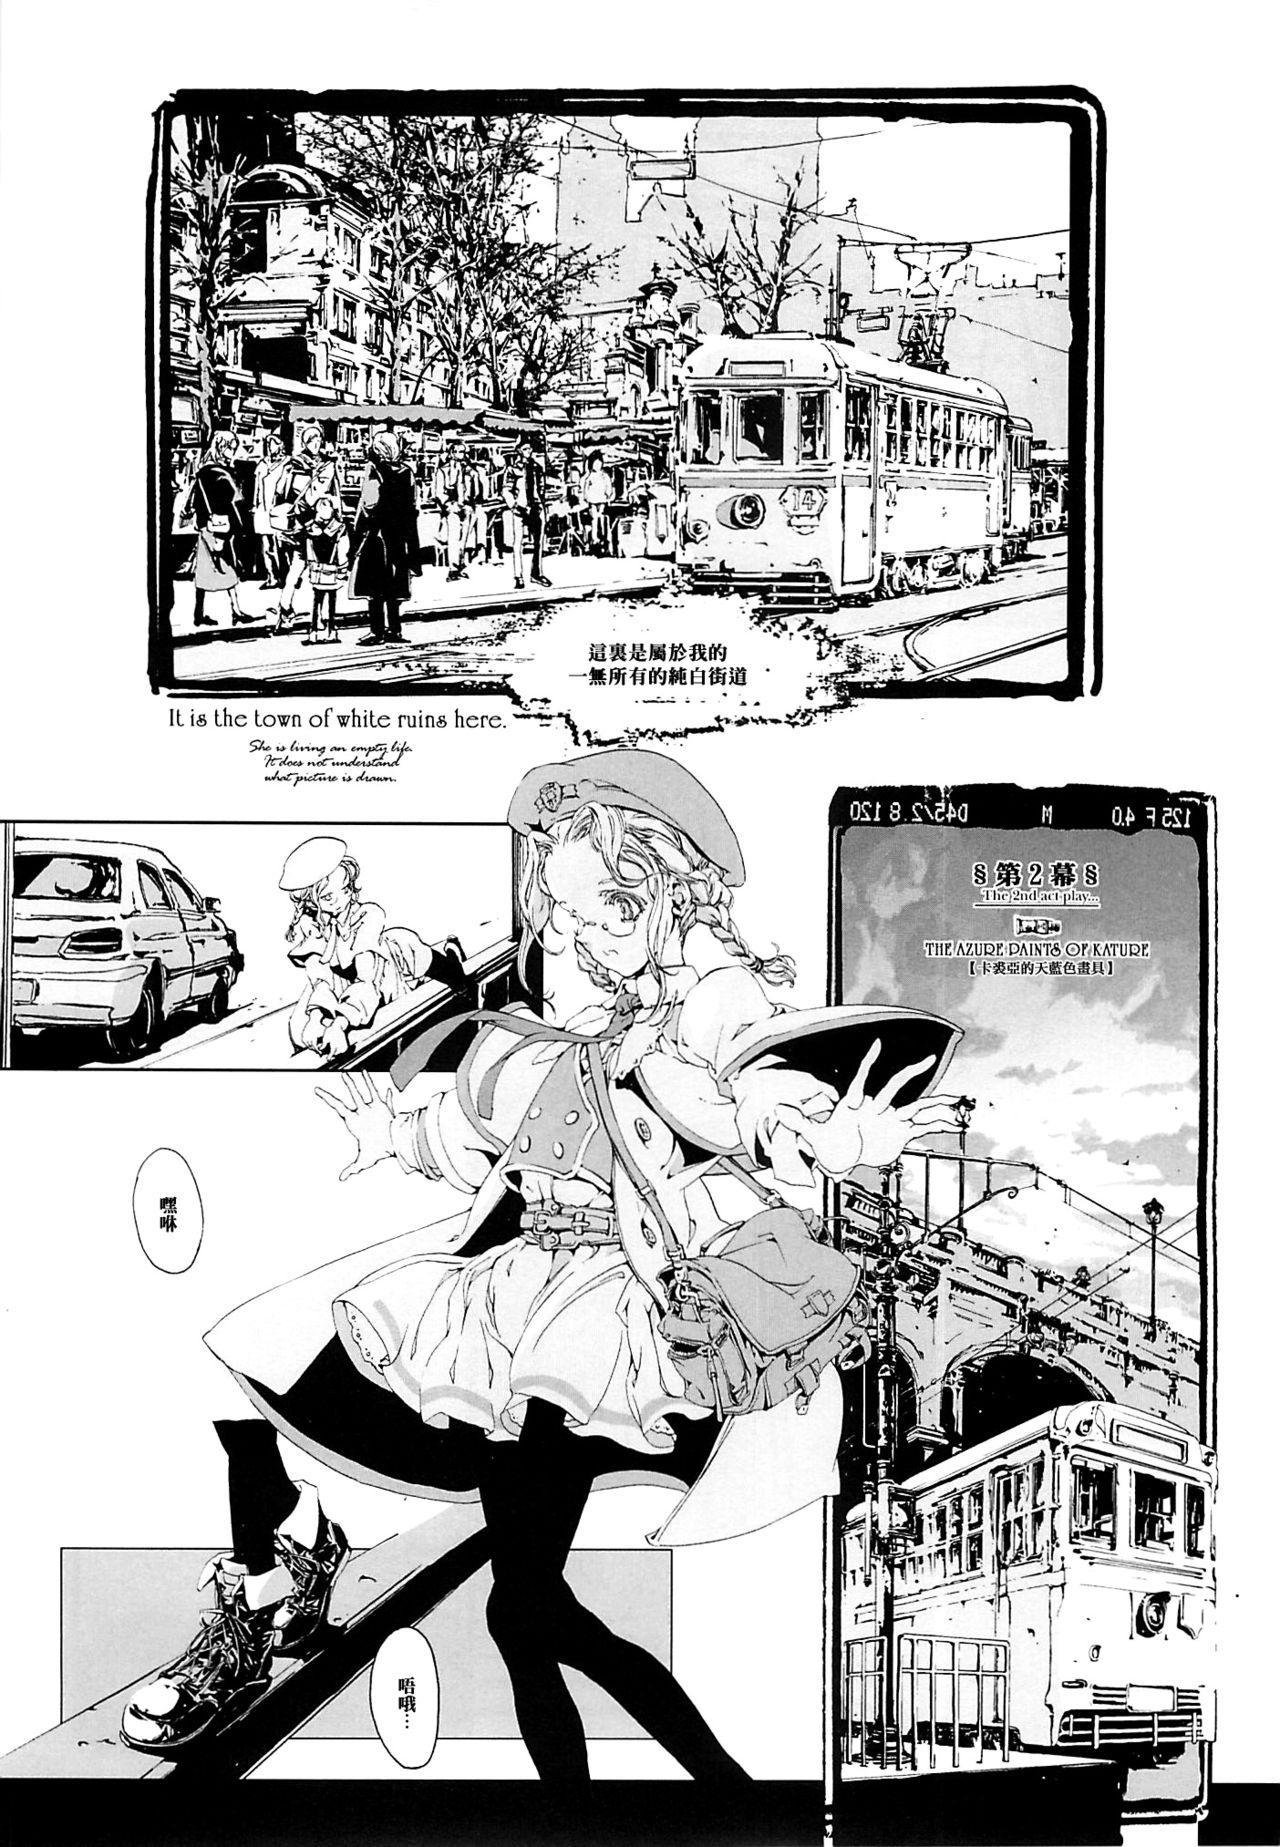 (CR37) [70 Nenshiki Yuukyuu Kikan (Endou Okito)] ORGAN-Tino  01-02[Chinese] [拾荒者汉化组] [Incomplete] 22